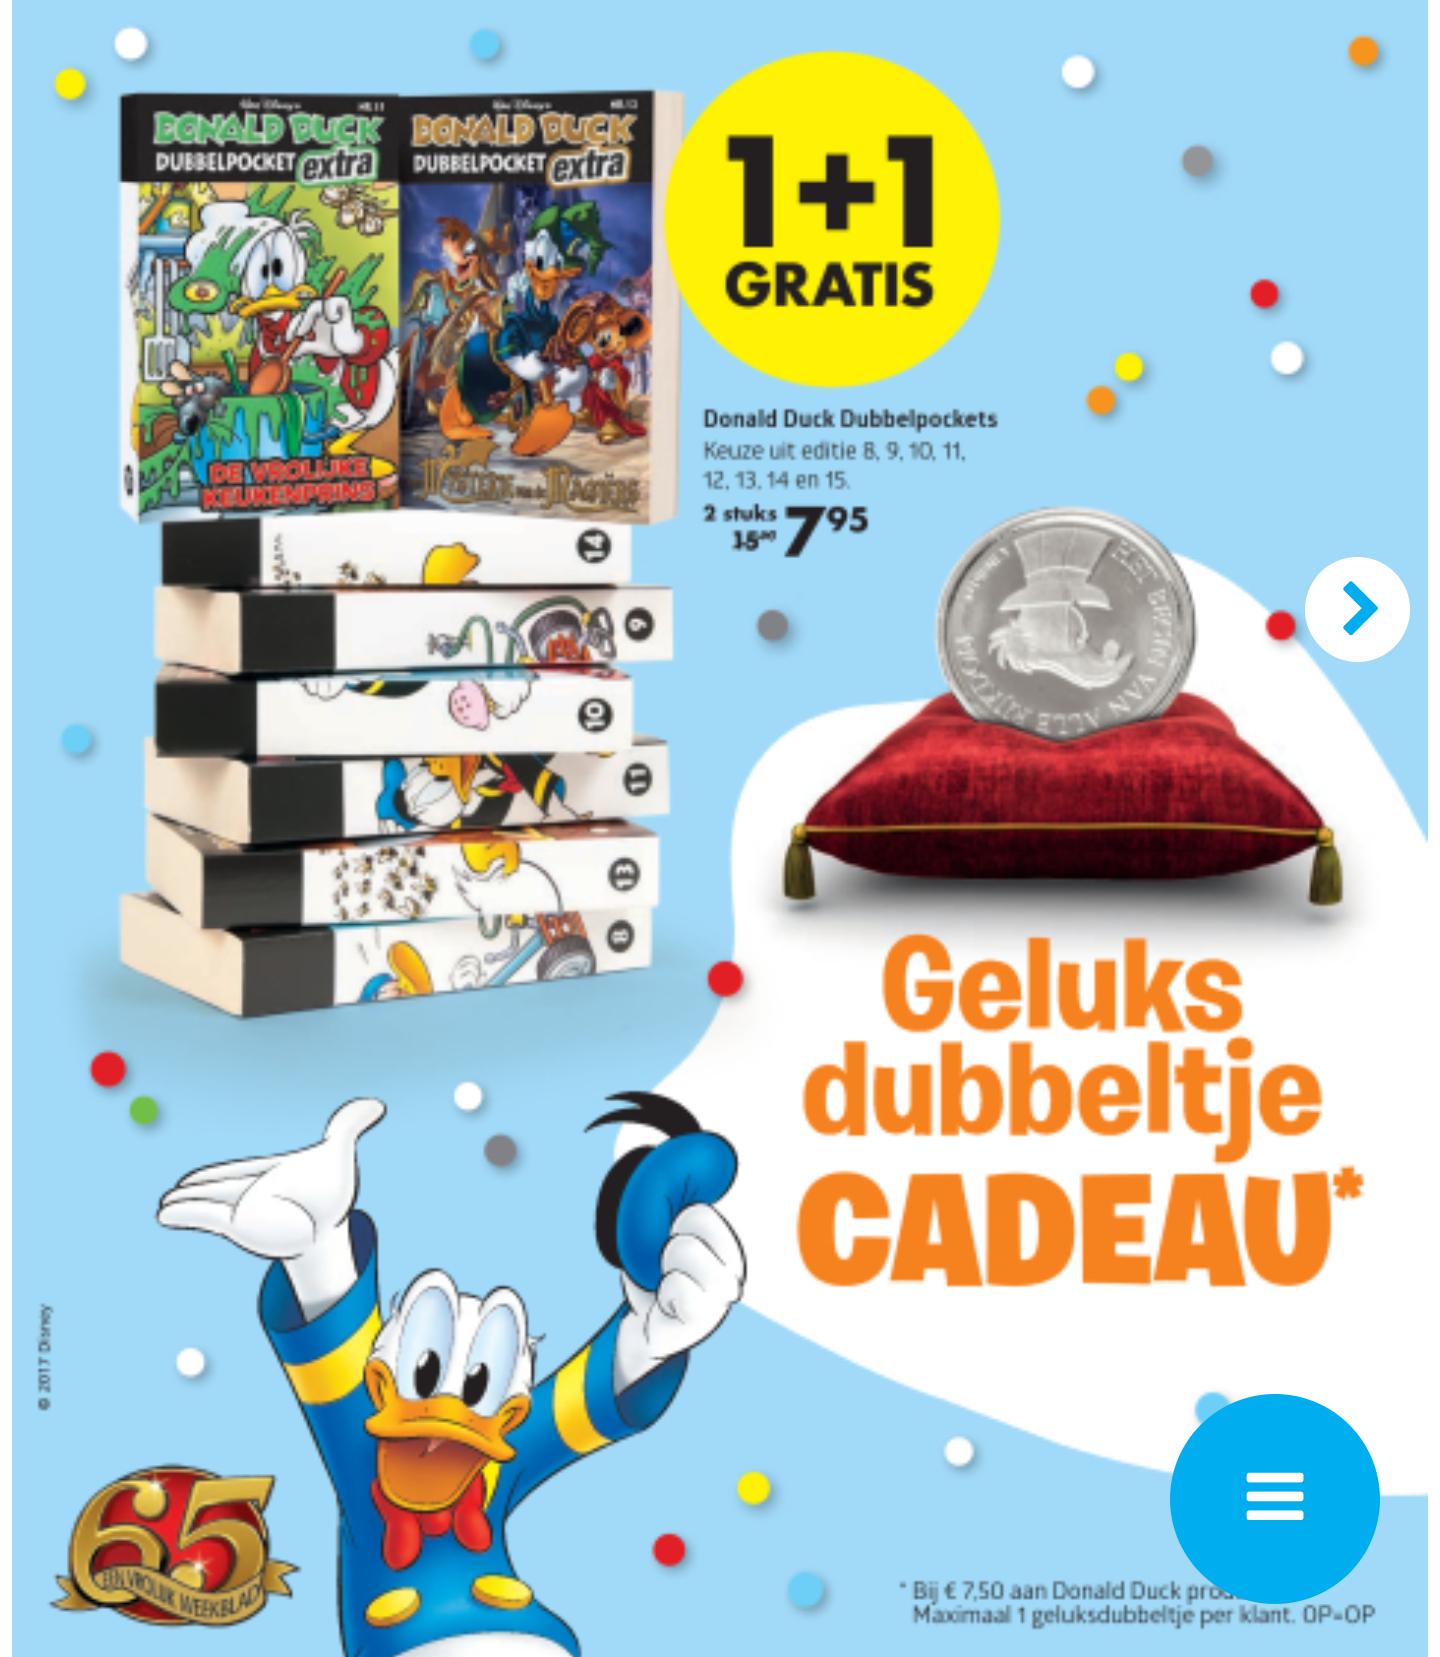 Donald Duck dubbelpockets 1+1 gratis + Geluksdubbeltje @ Bruna